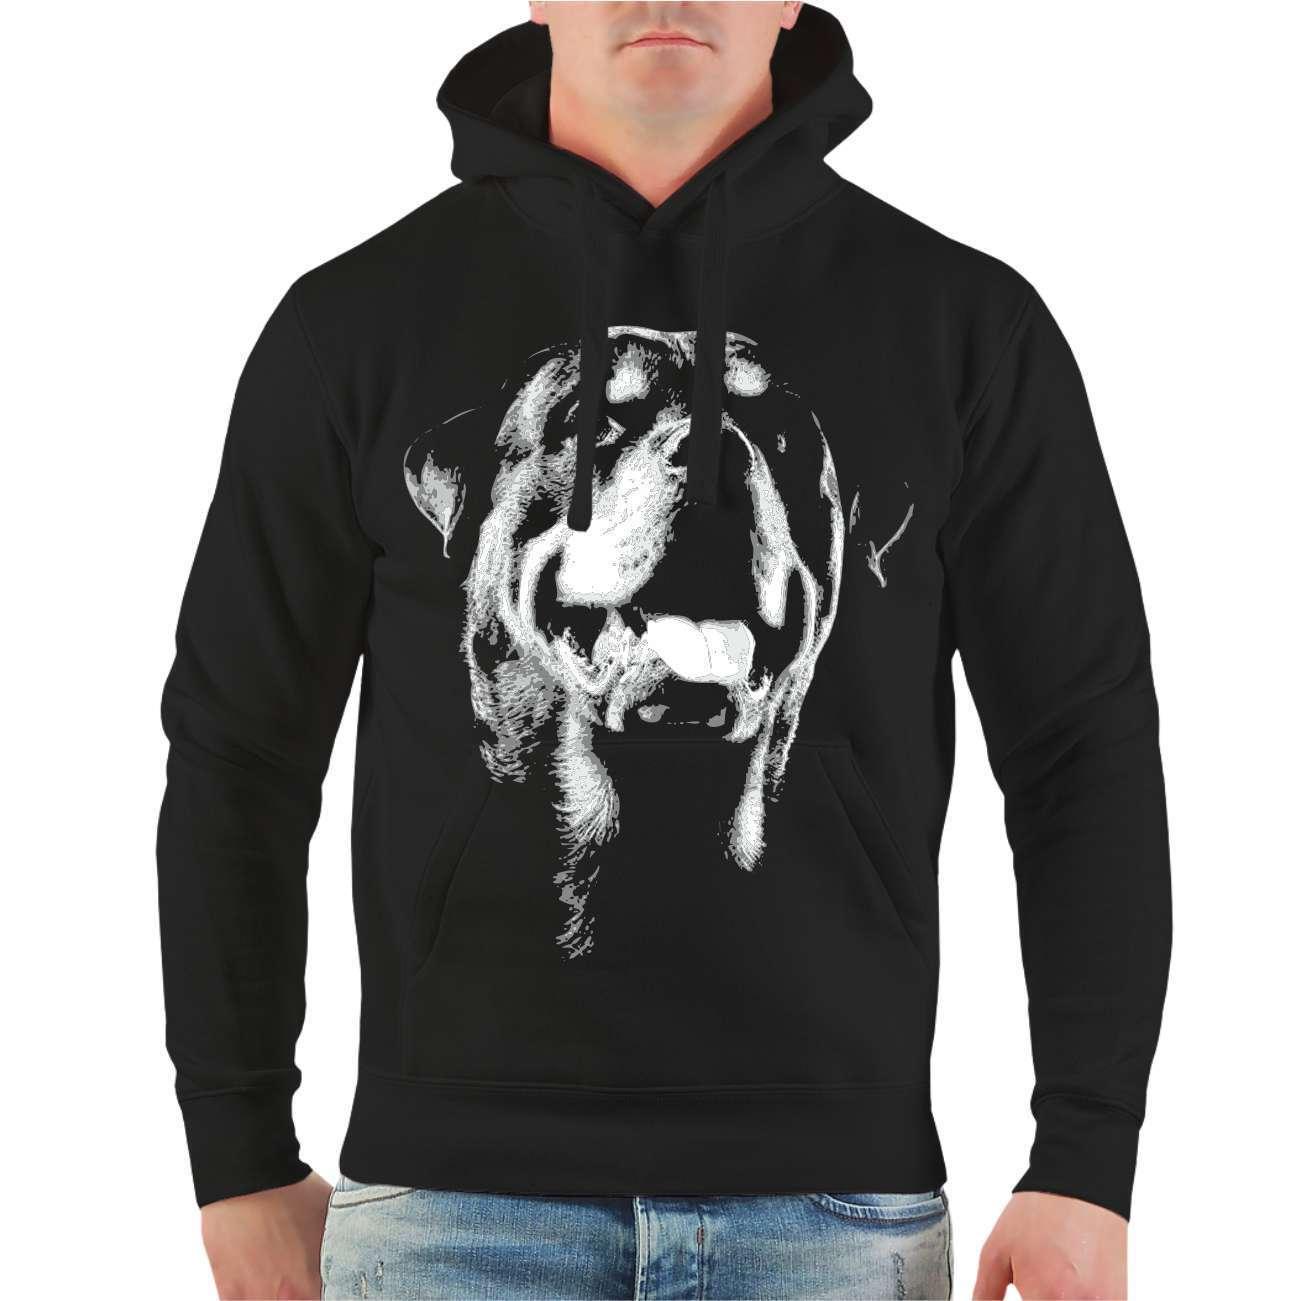 Kapuzenpullover Sweatshirt Hoodie Rottweiler BOSS hunde dogs rasse welpen zucht